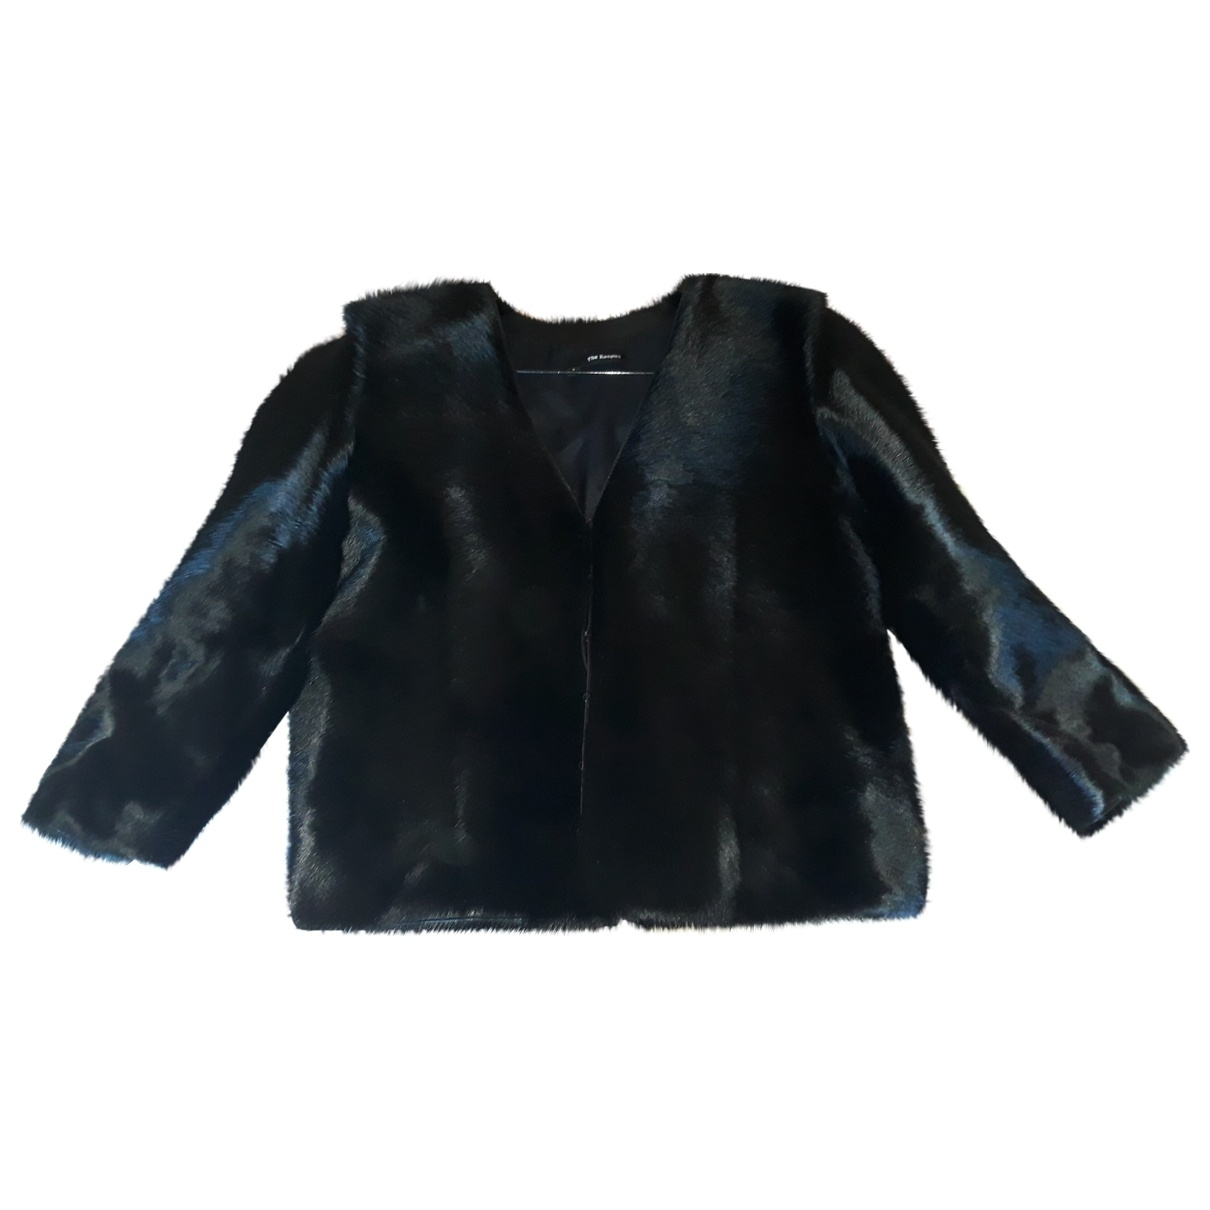 The Kooples \N Black Fur jacket for Women S International